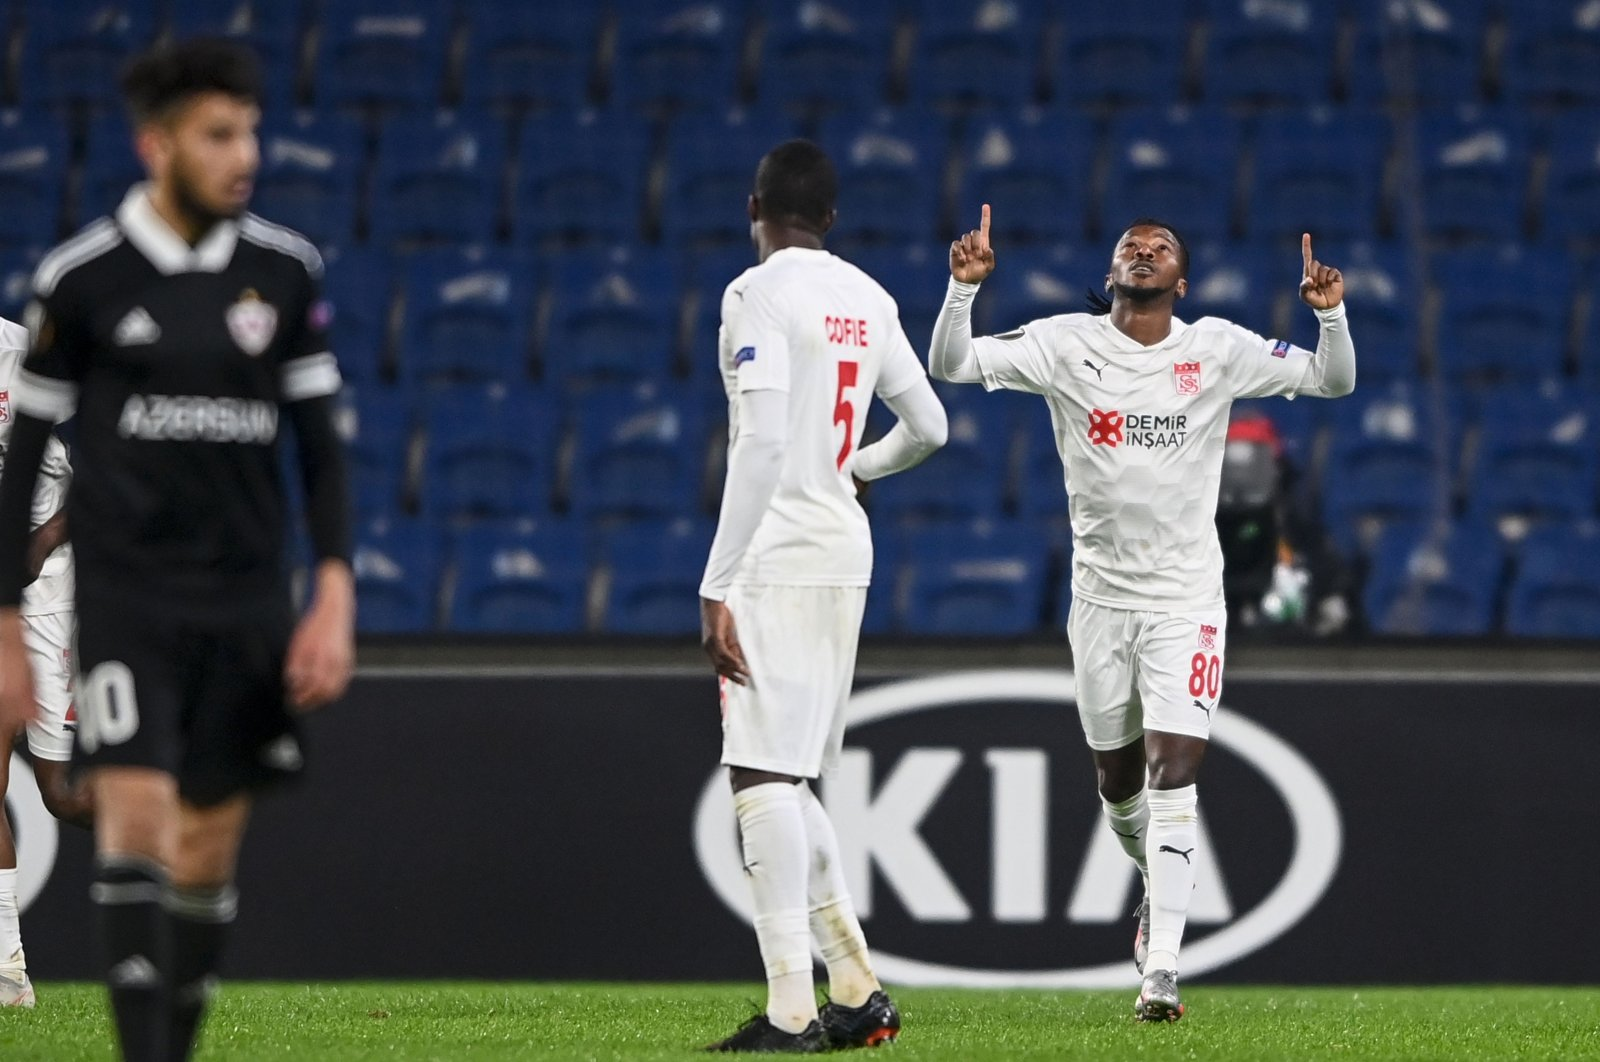 Sivasspor's Nigerian forward Olarenwaju Kayode (R) celebrates after scoring a goal during the UEFA Europa League group I football match between Qarabağ and Sivasspor at Fatih Terim Stadium in Istanbul, on Nov. 26, 2020. (AFP Photo)